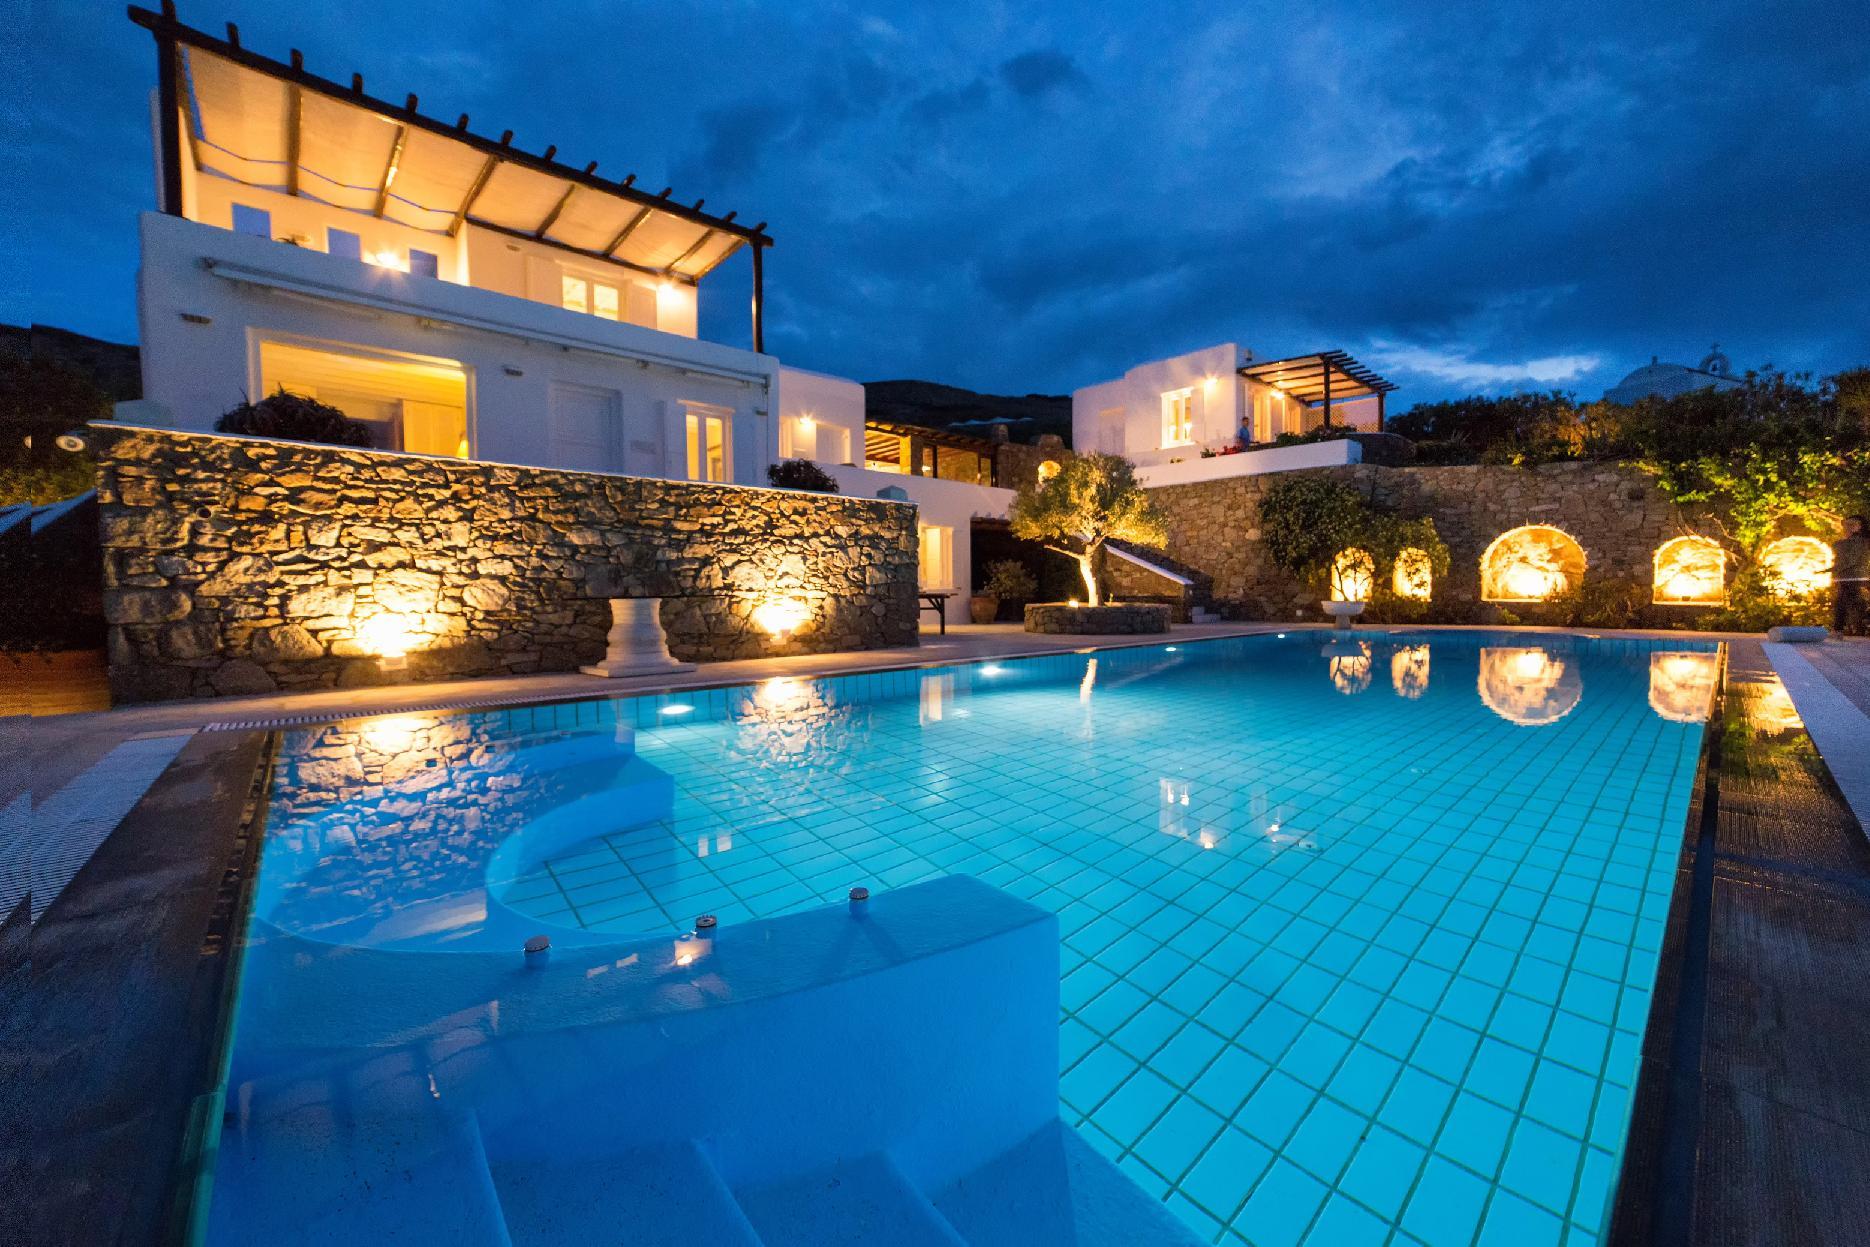 Apartment HOUSE OF THE SUN The Galaxy Mykonos villa photo 1411919